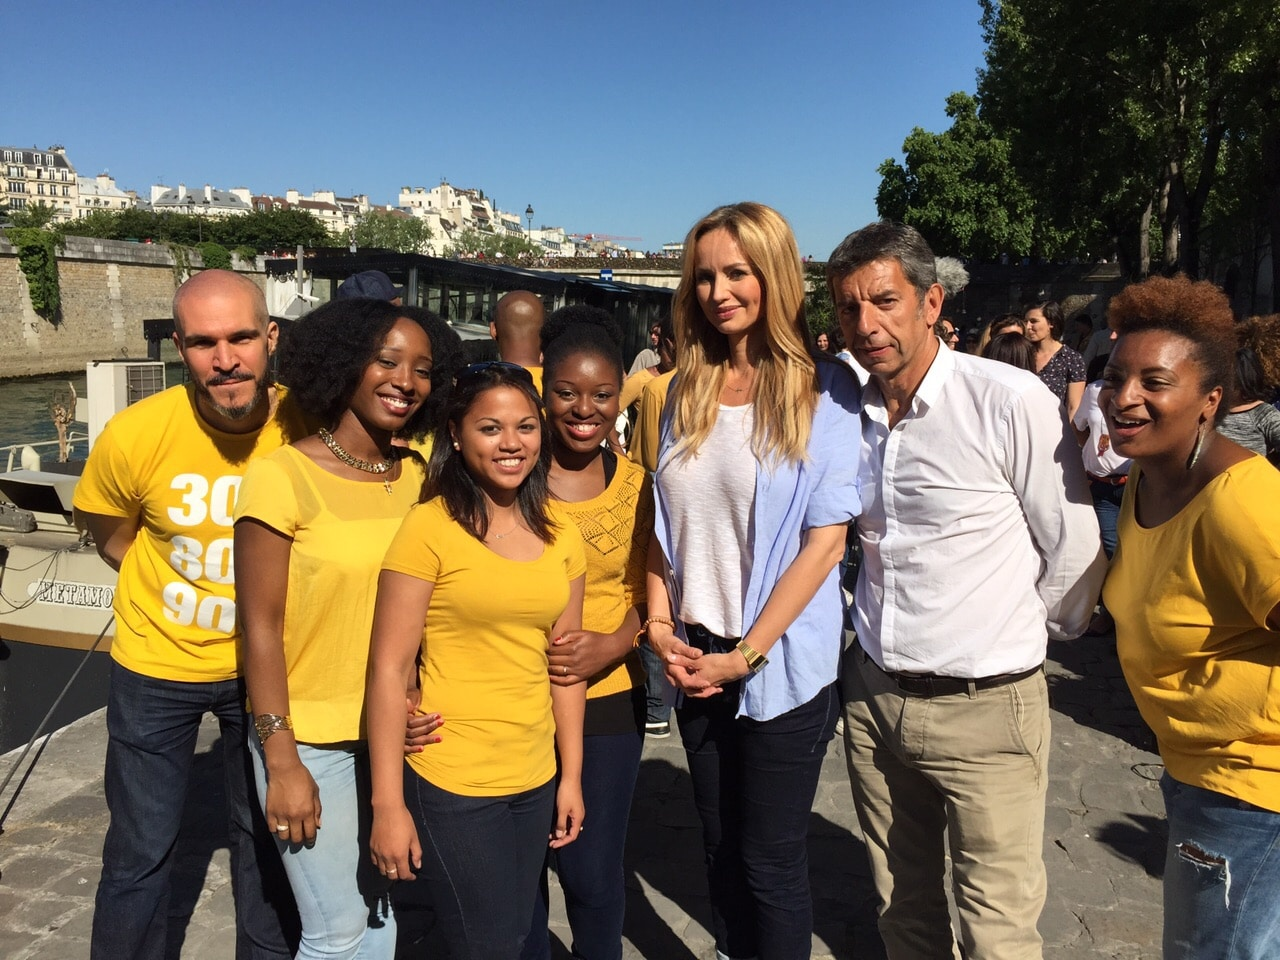 Michel et Adriana 2 chorale gospel VOICE2GETHER_ tournage emission TV France 2_ Michel Cymes et Adriana Karembeu